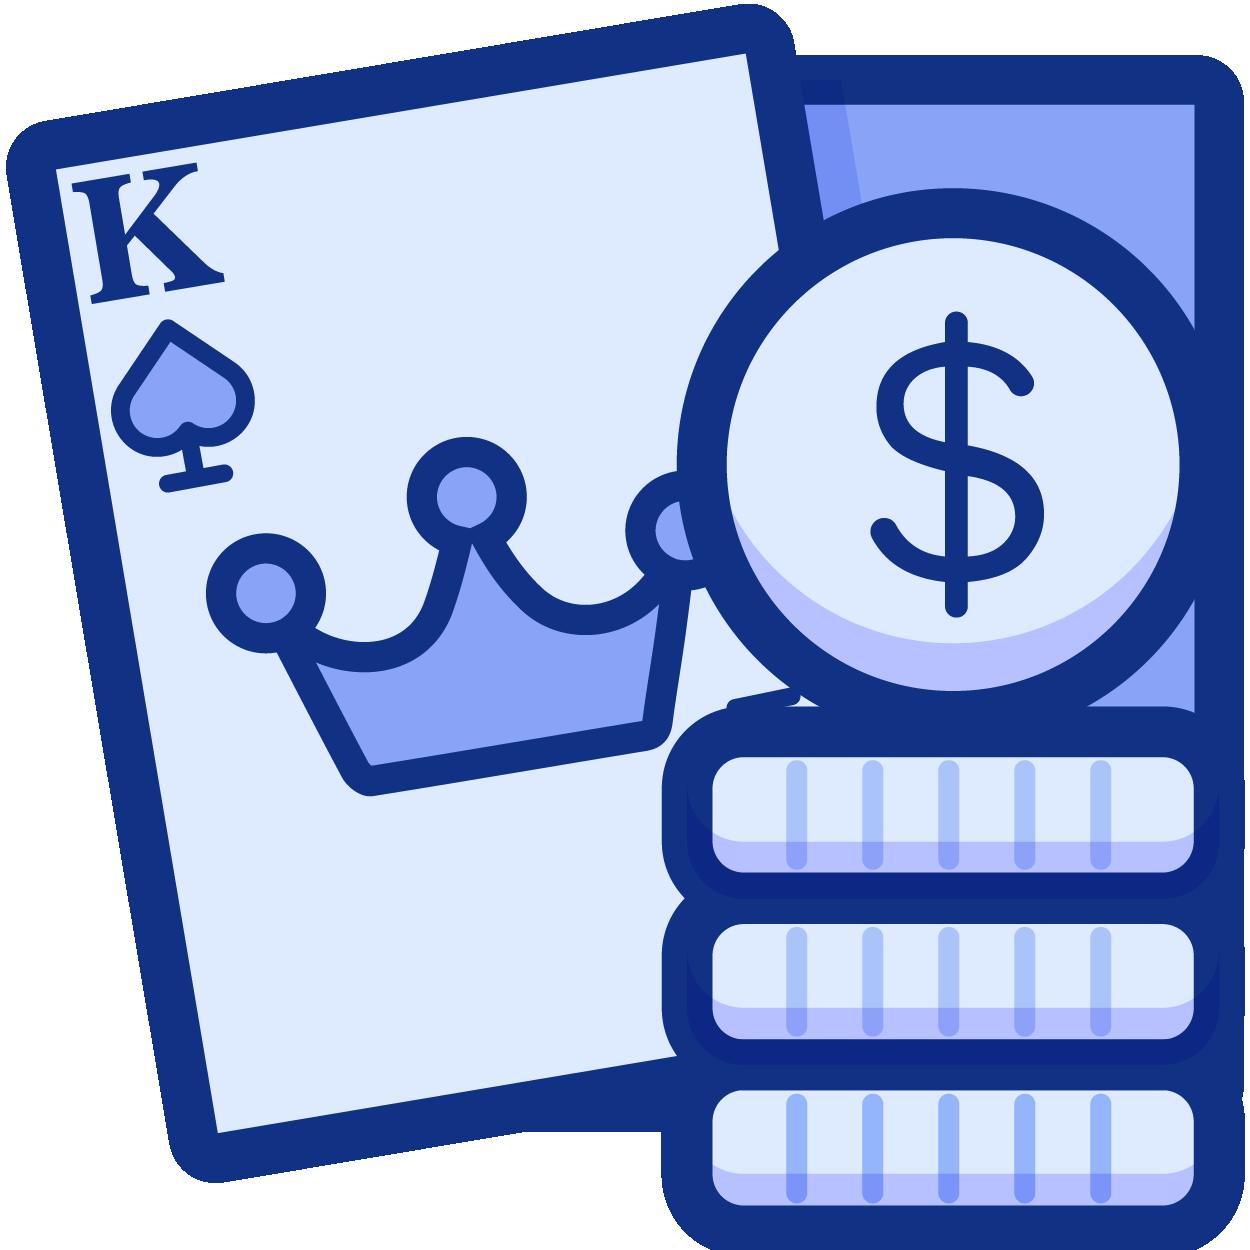 Gambling in the casino icon